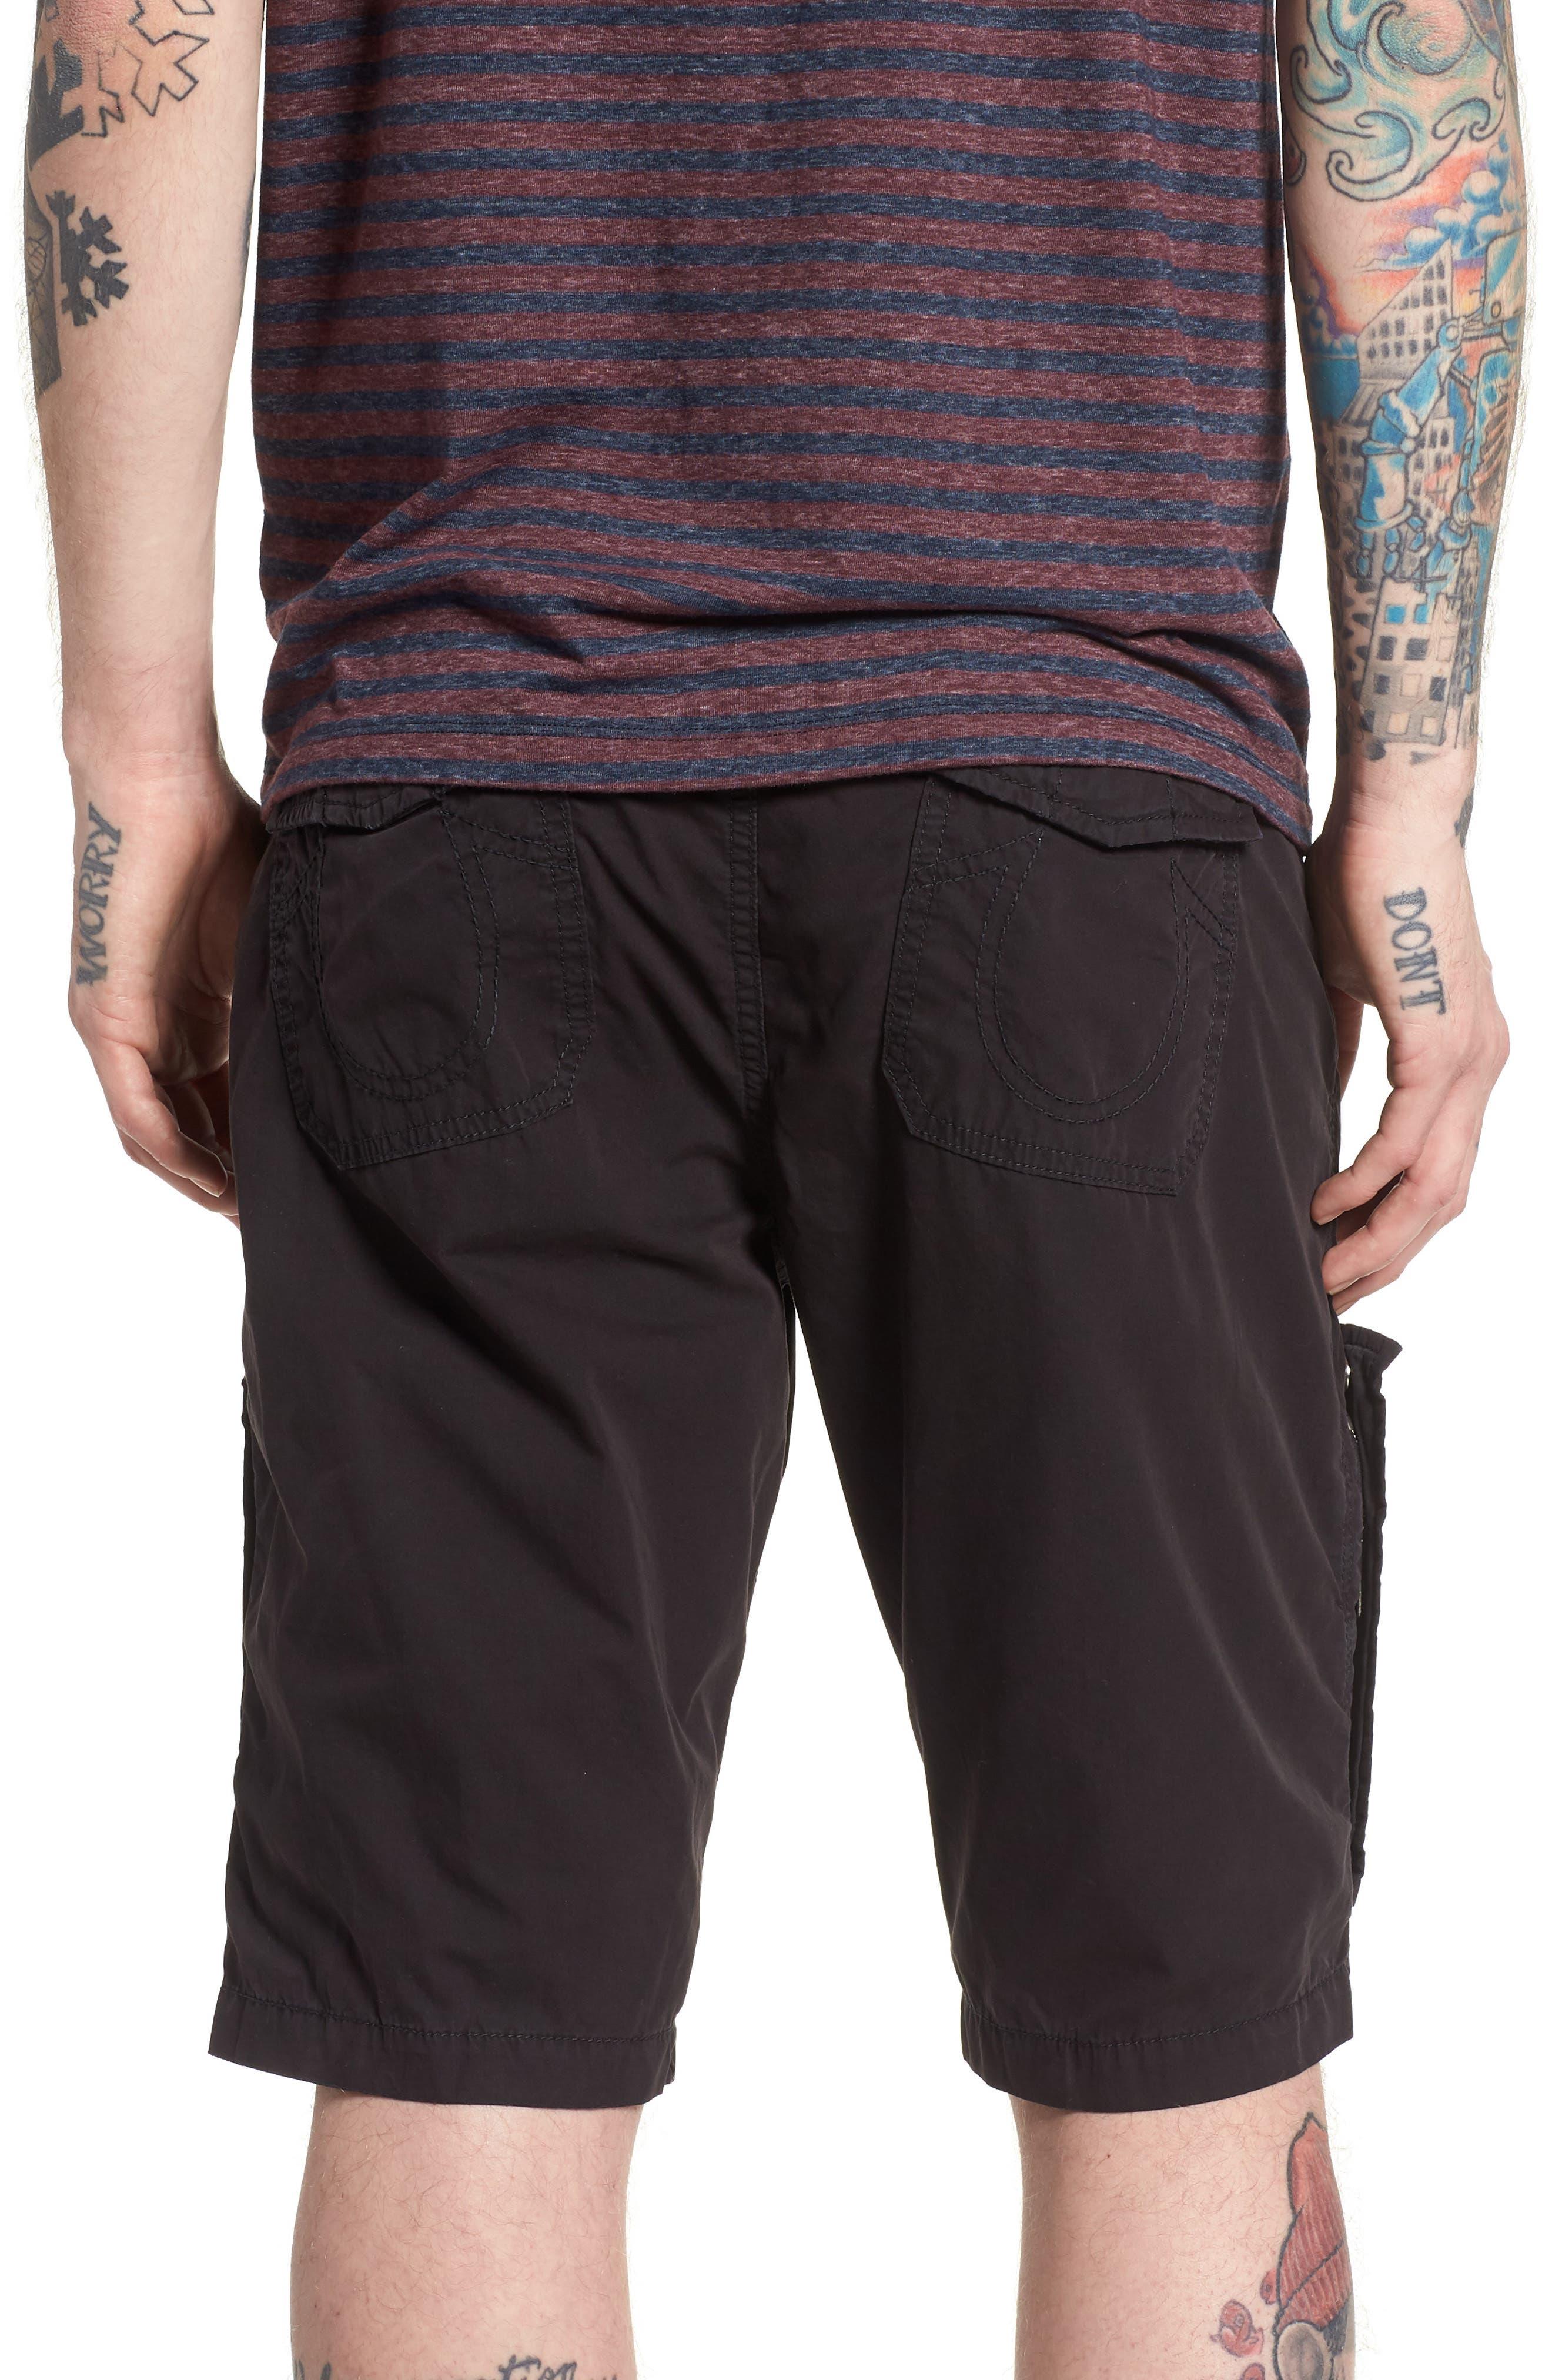 Officer Field Shorts,                             Alternate thumbnail 2, color,                             Black